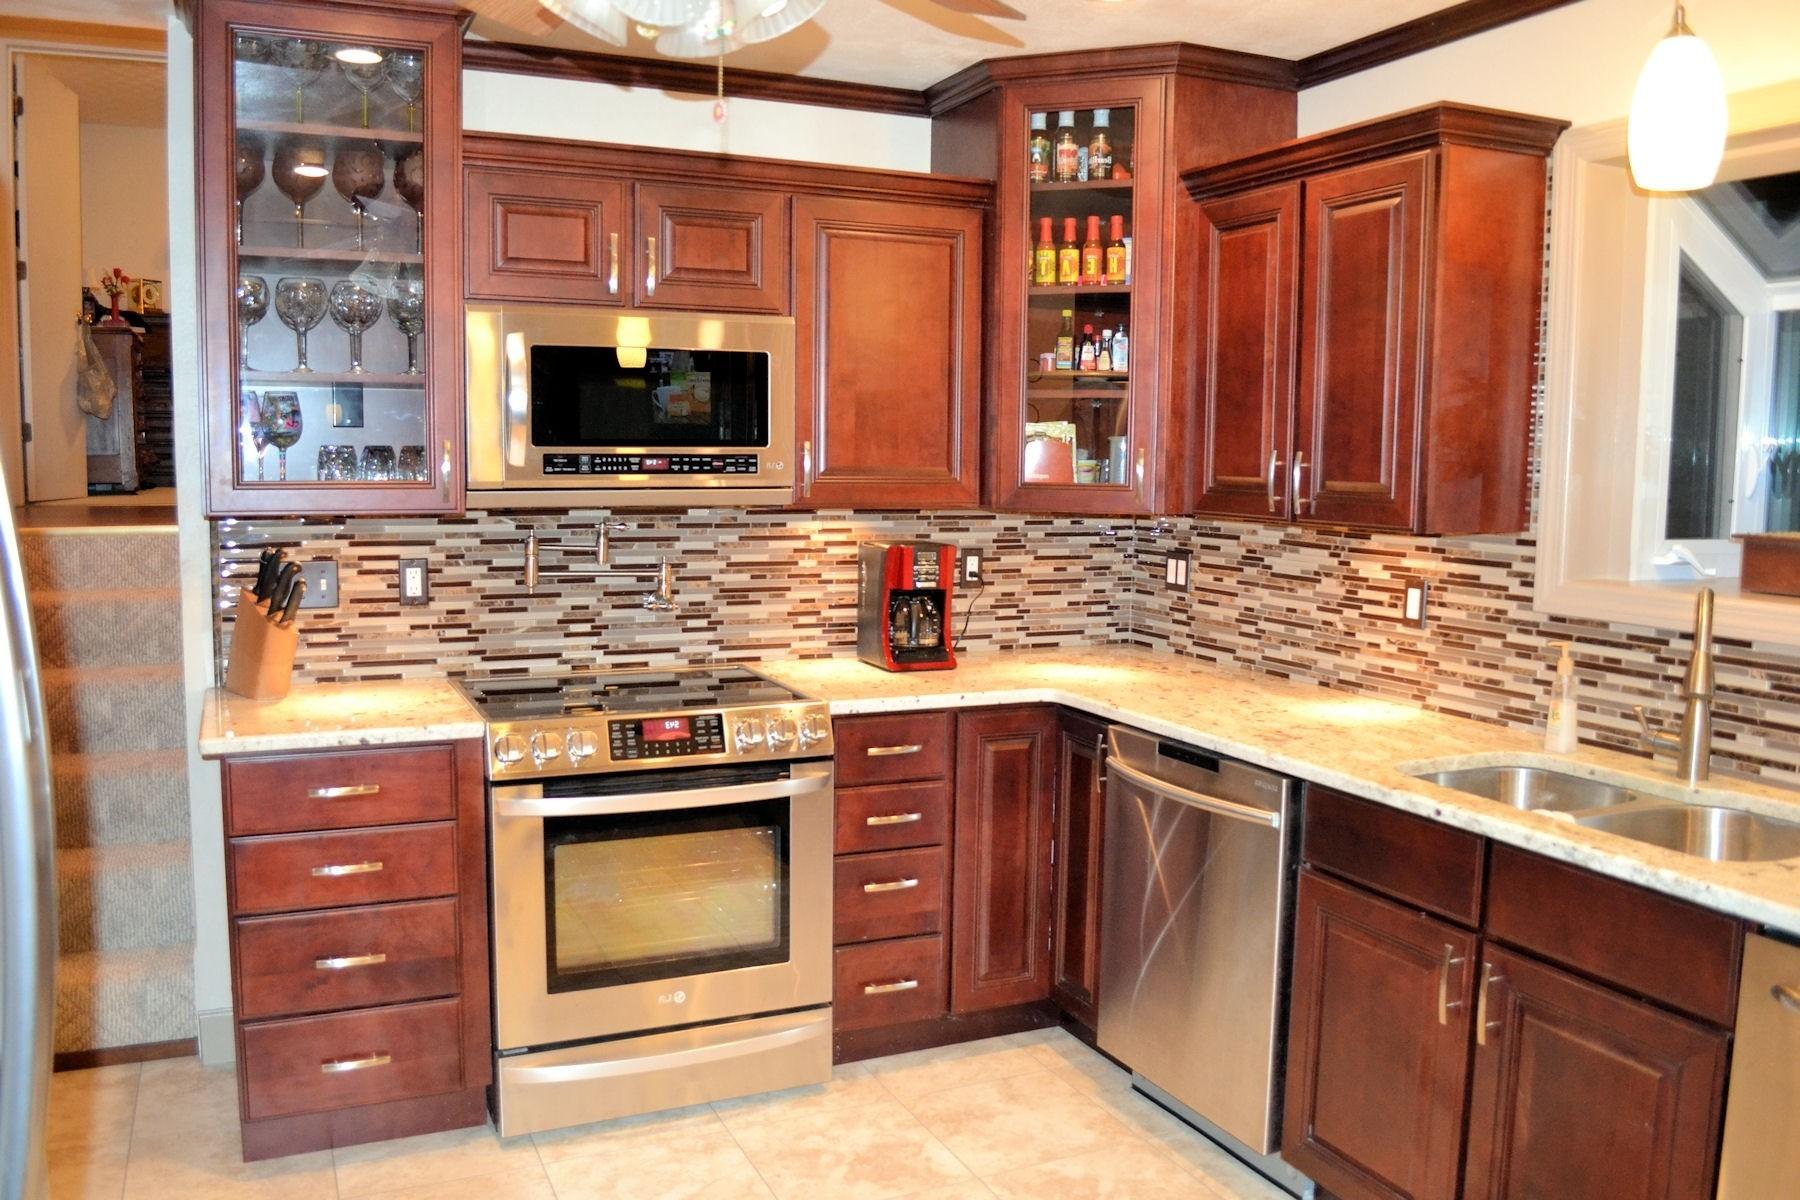 Kitchen Backsplash Ideas Maple Cabinets Pics ... on Natural Maple Kitchen Backsplash Ideas With Maple Cabinets  id=72449